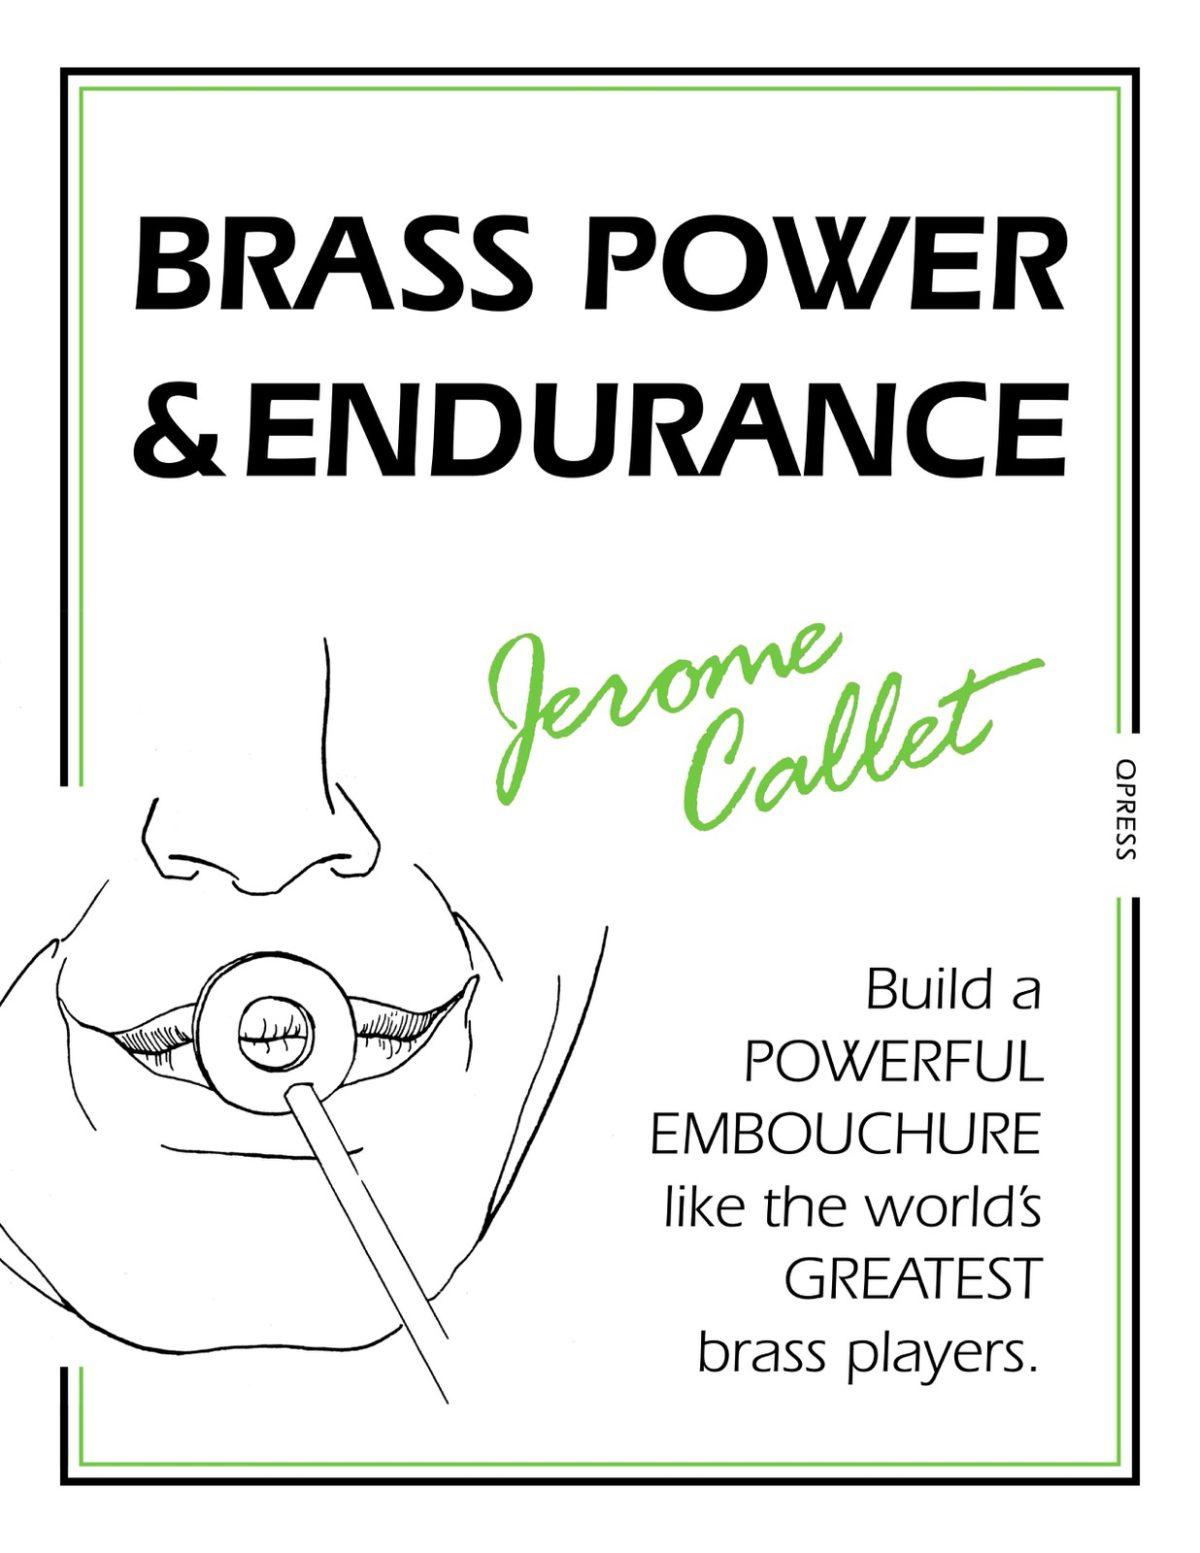 Brass Power and Endurance